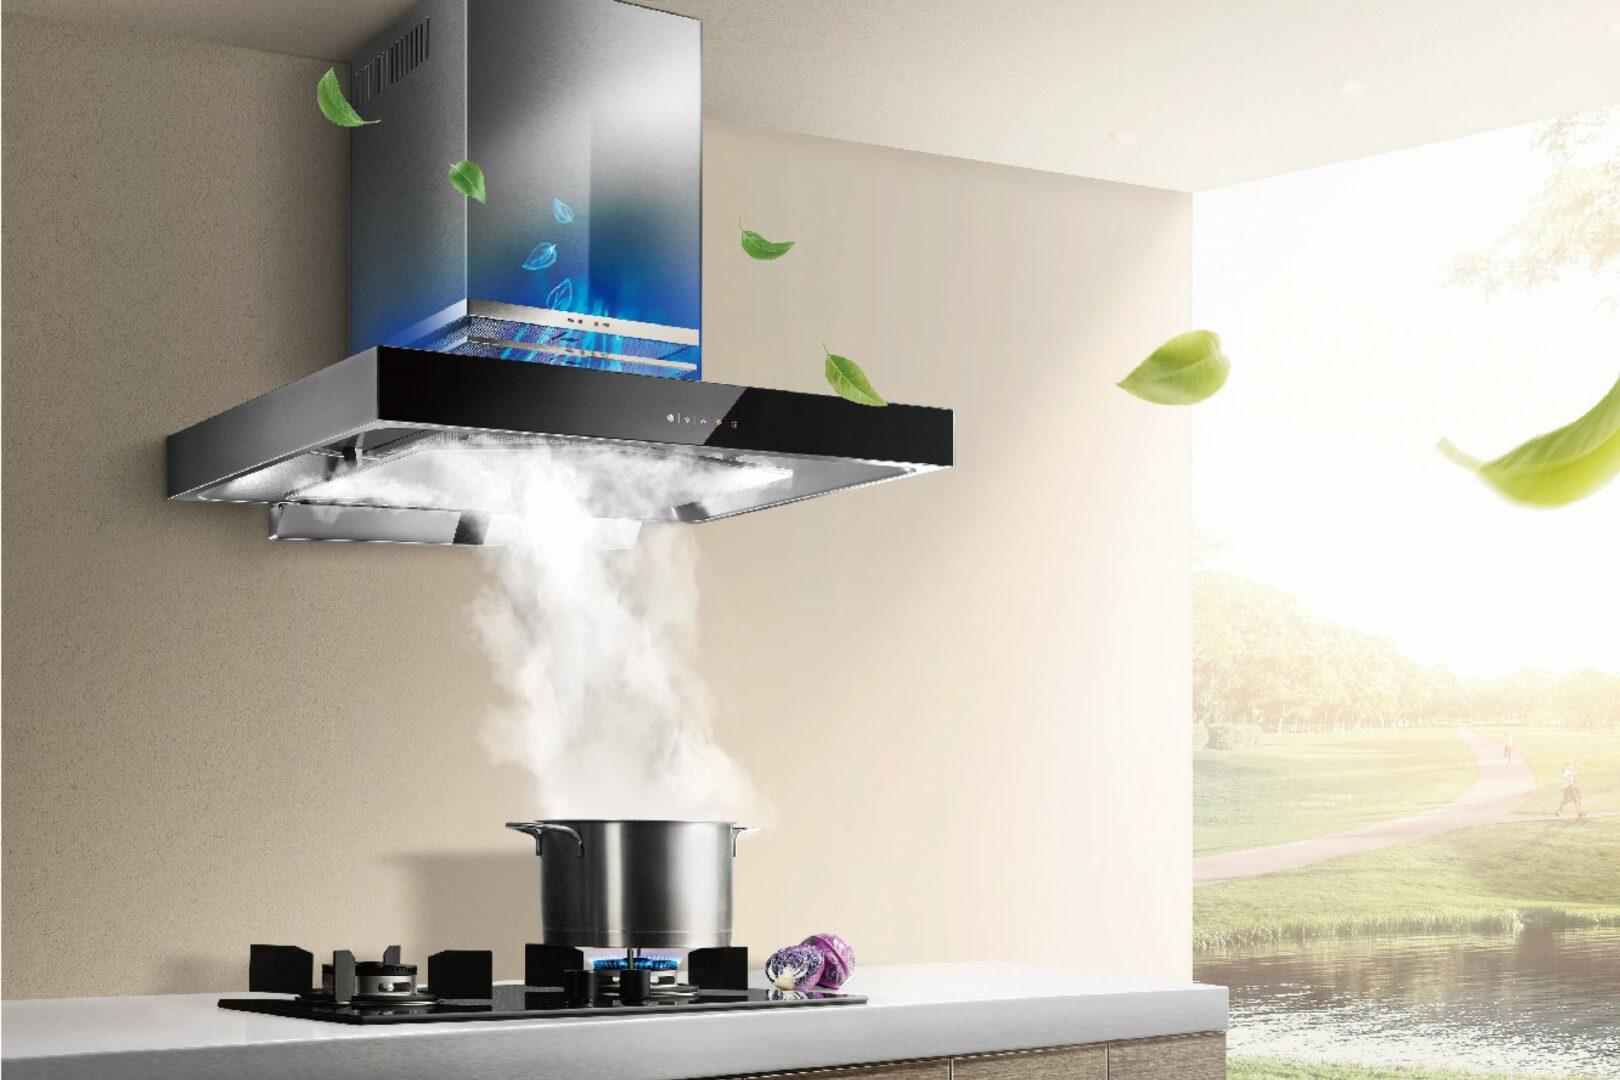 L'importanza di una buona ventilazione in cucina